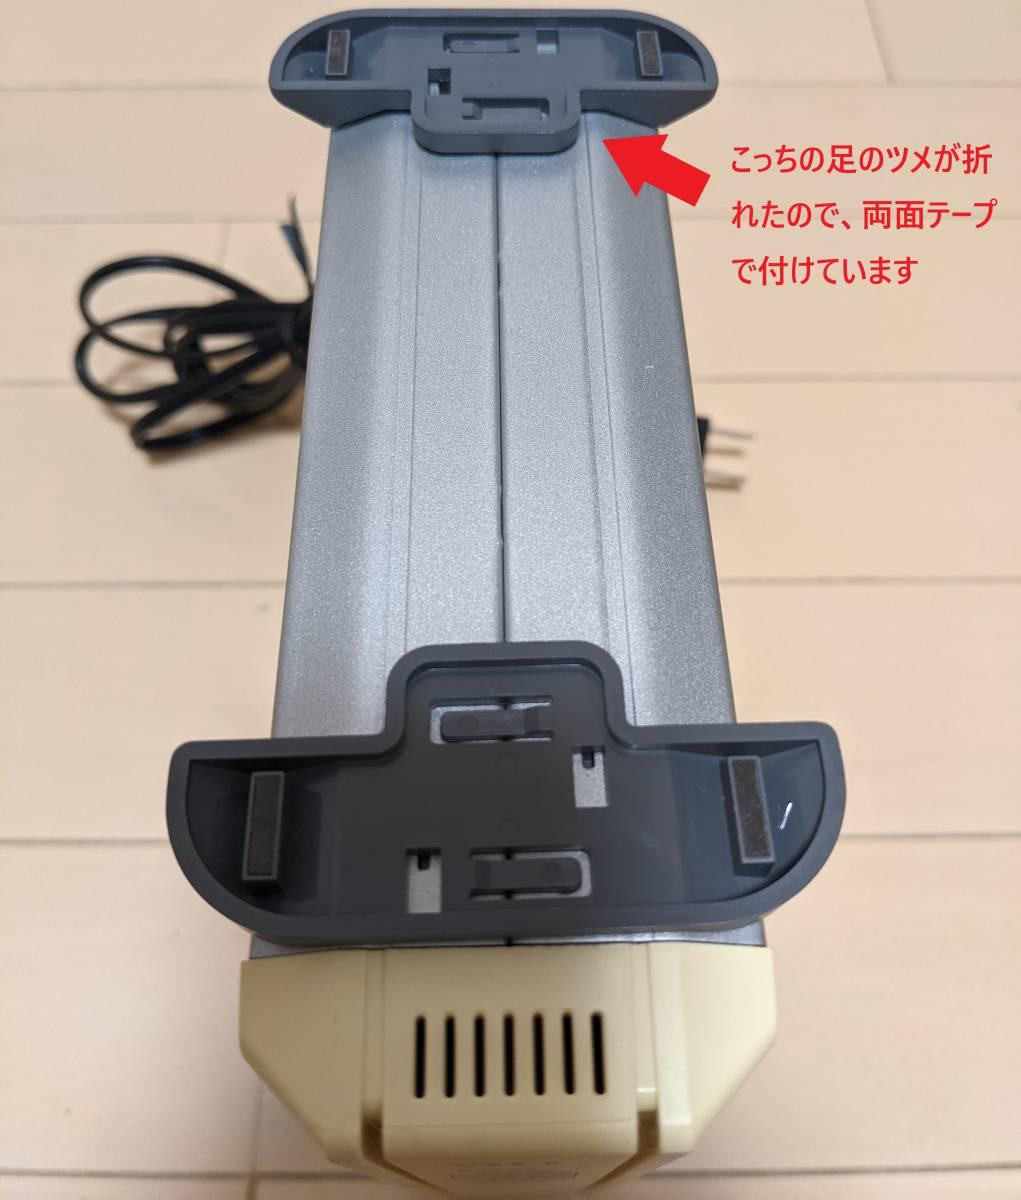 BUFFALO / USBハードディスク / HD-250U2 / 250GB USB HDD / 動作確認済 / 送料無料